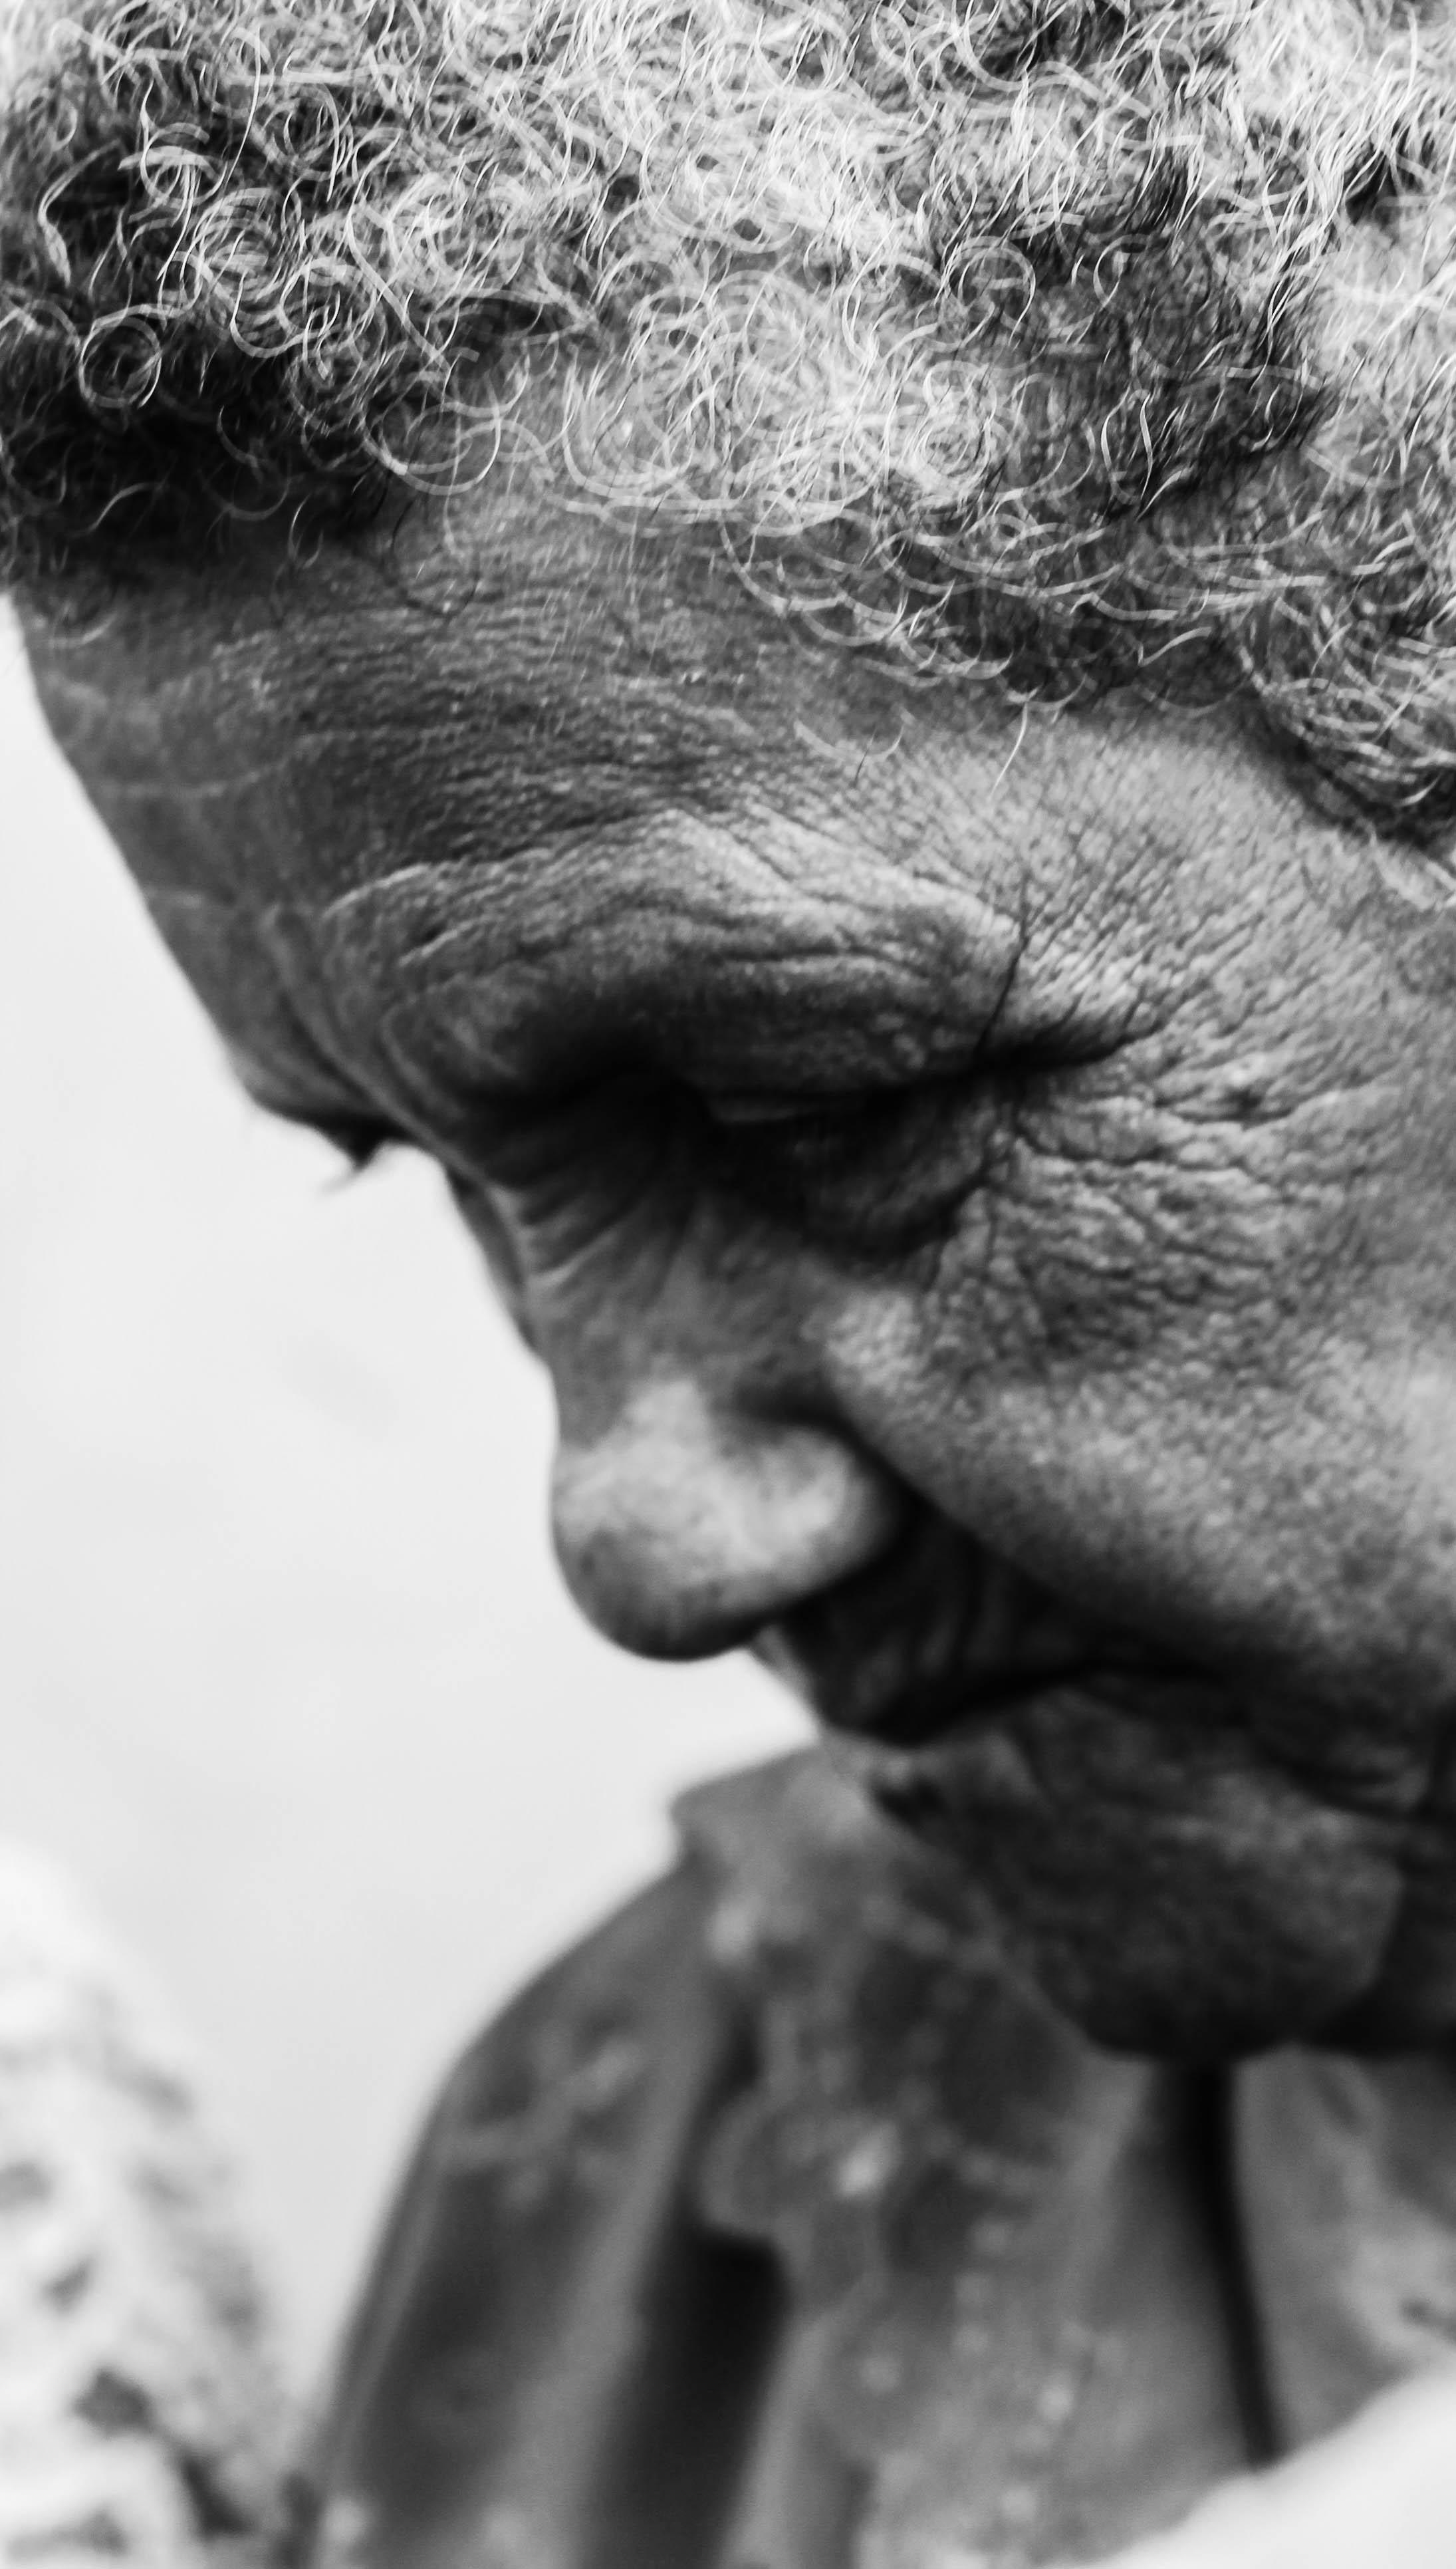 old-woman-dia-virgen-merced-leon-nicaragua